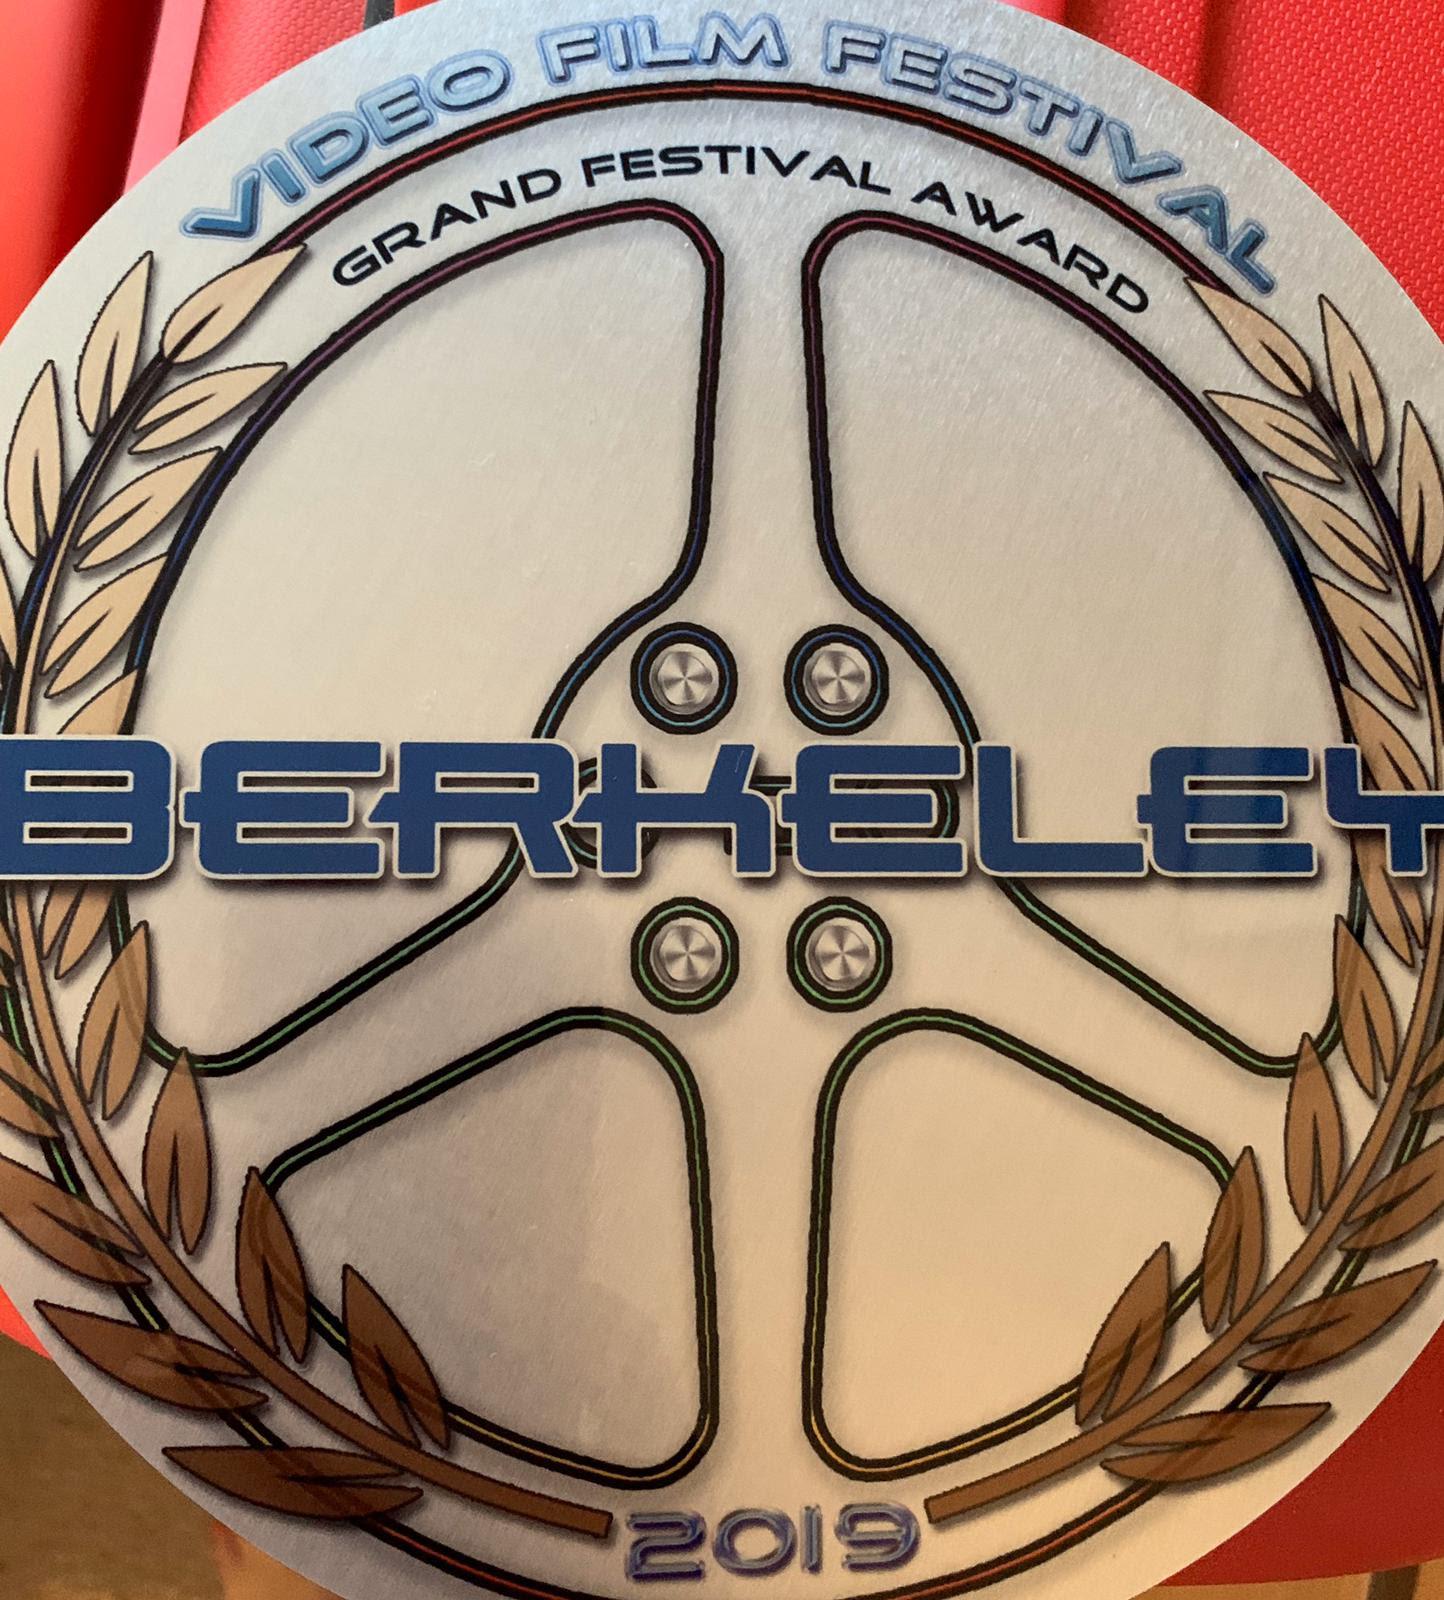 Berkeley Grand Festival Award - November 2019